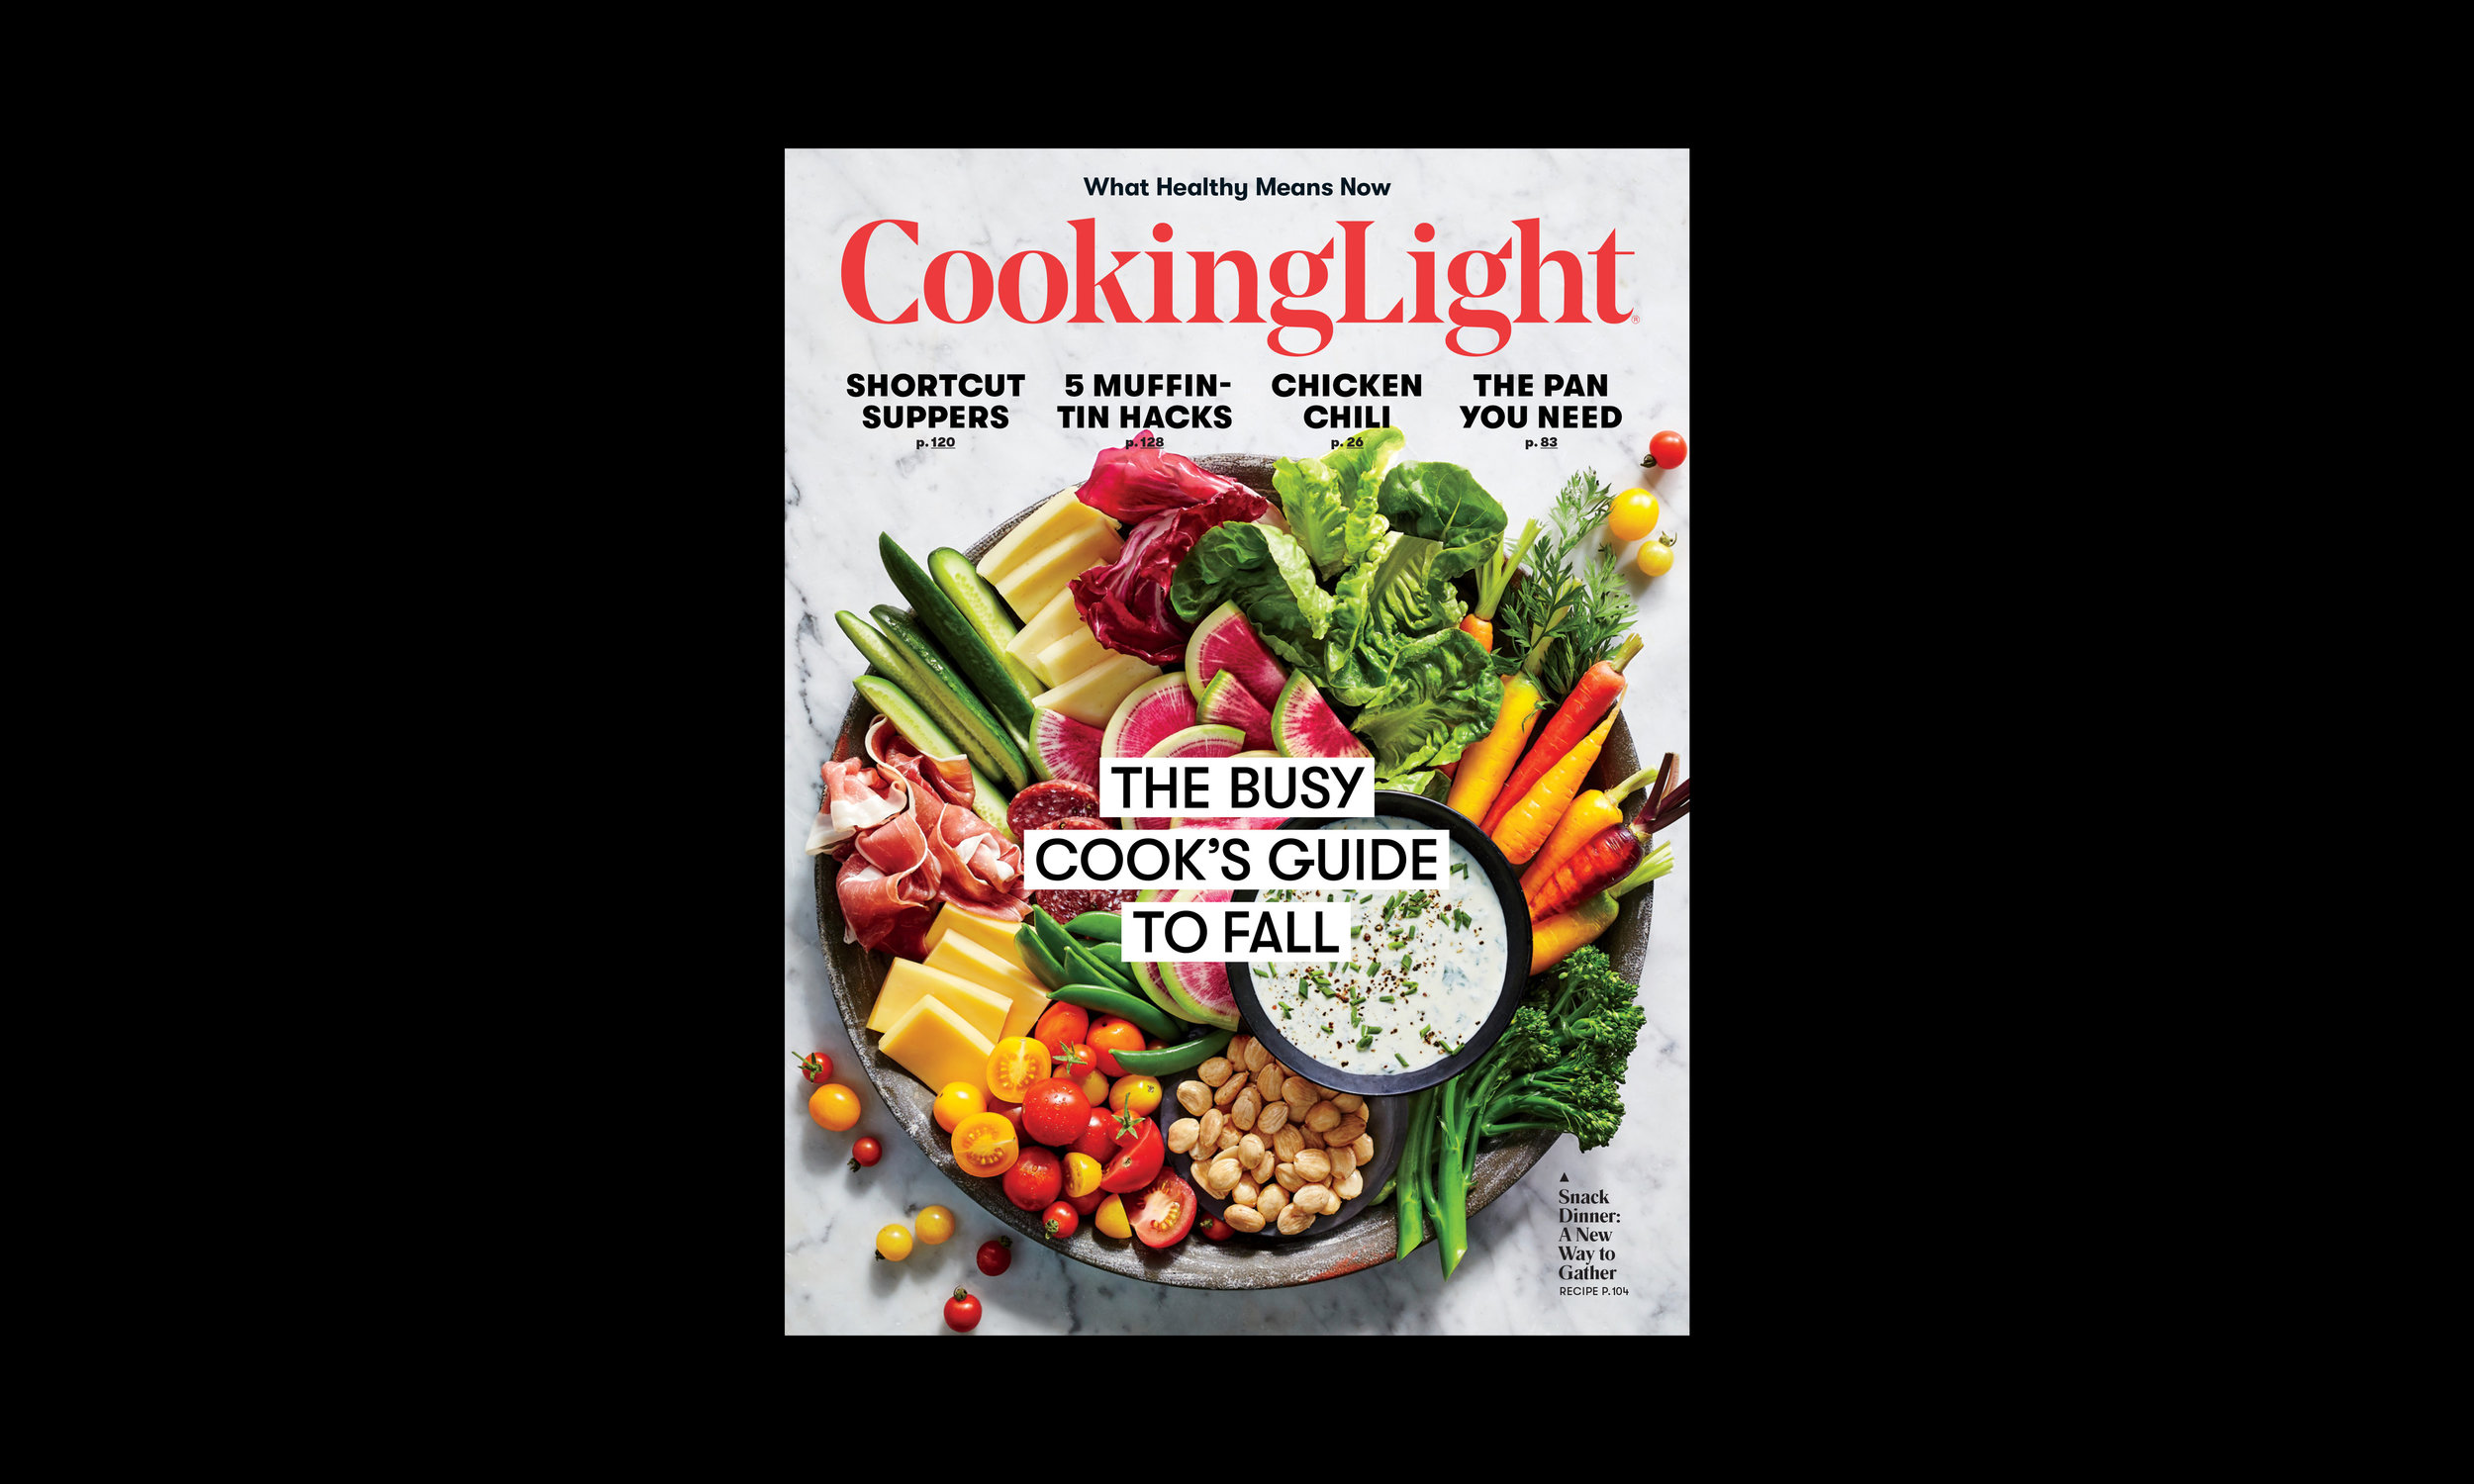 cookinglight_redesign_slides_1_3.jpg